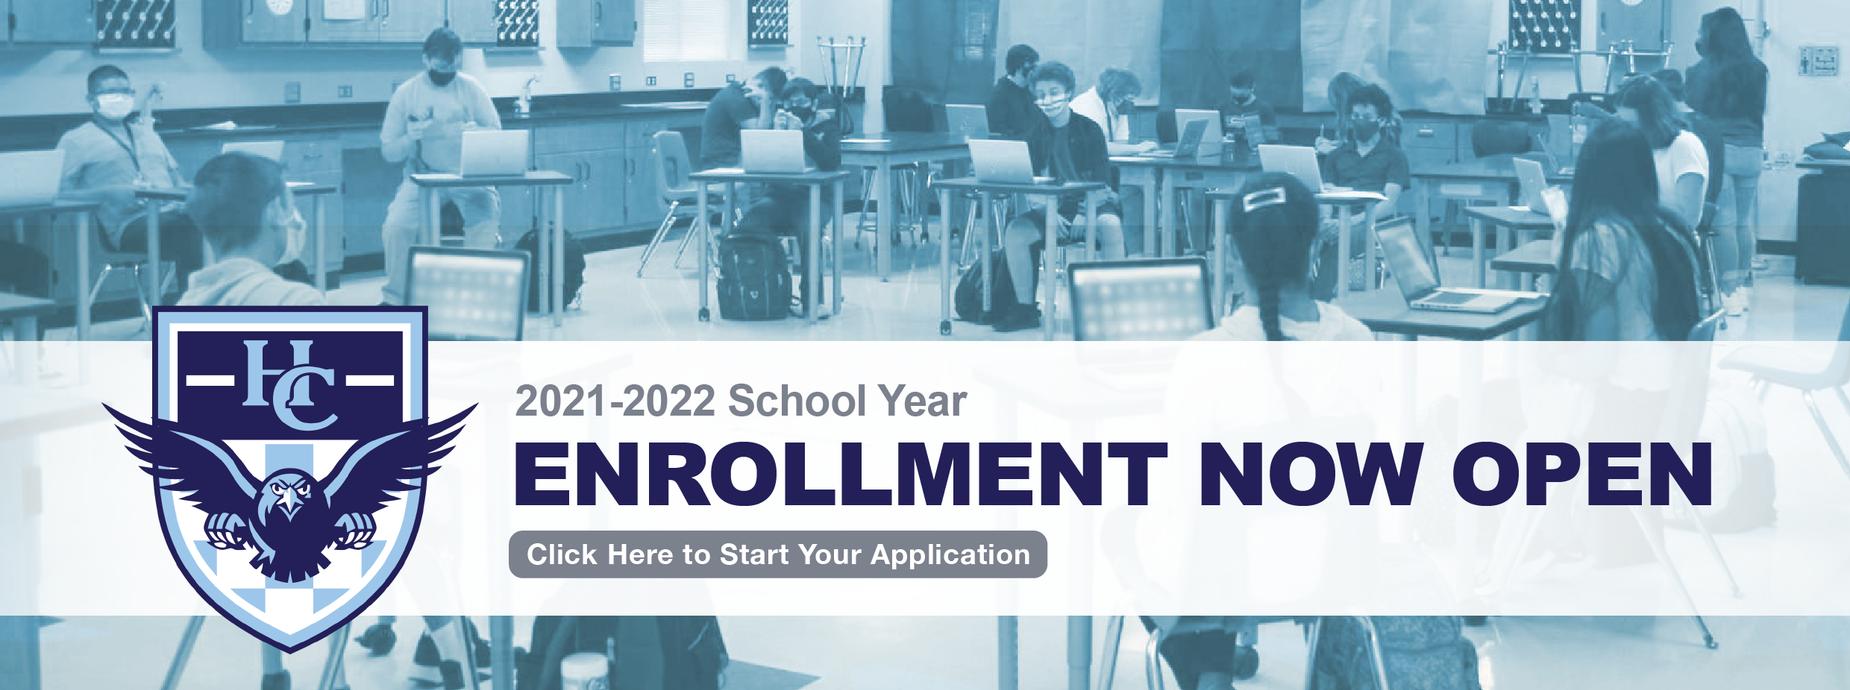 Enrollment now open